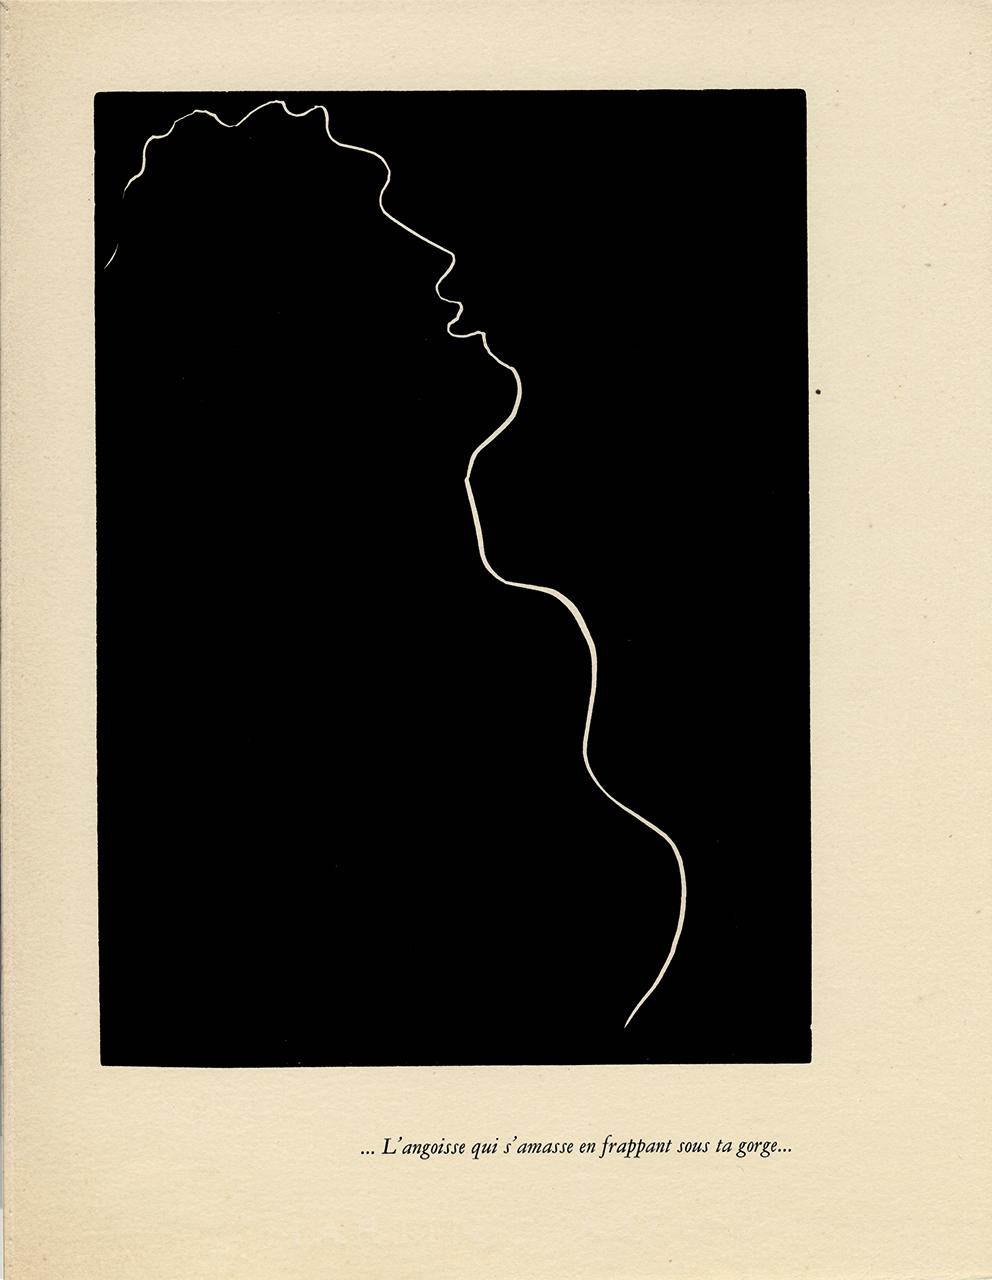 "Henry Matisse Henry de MontherlantPasiphaé, Chant de Minos (Les Crétois) (Pasiphaé, Song of Minos [The Cretans])Paris: Martin Fabiani, 1944Number 17 of 250 copies...L'angoisse qui s'amasse en frappant sous ta gorge...(The Fear Which Grows and Sticks in Your Throat)Linocut on vélin d'Arches filigrané paper, 13 1/5"" x 10 1/10"" (© 2015 Succession H. Matisse / Artists Rights Society, New York)"